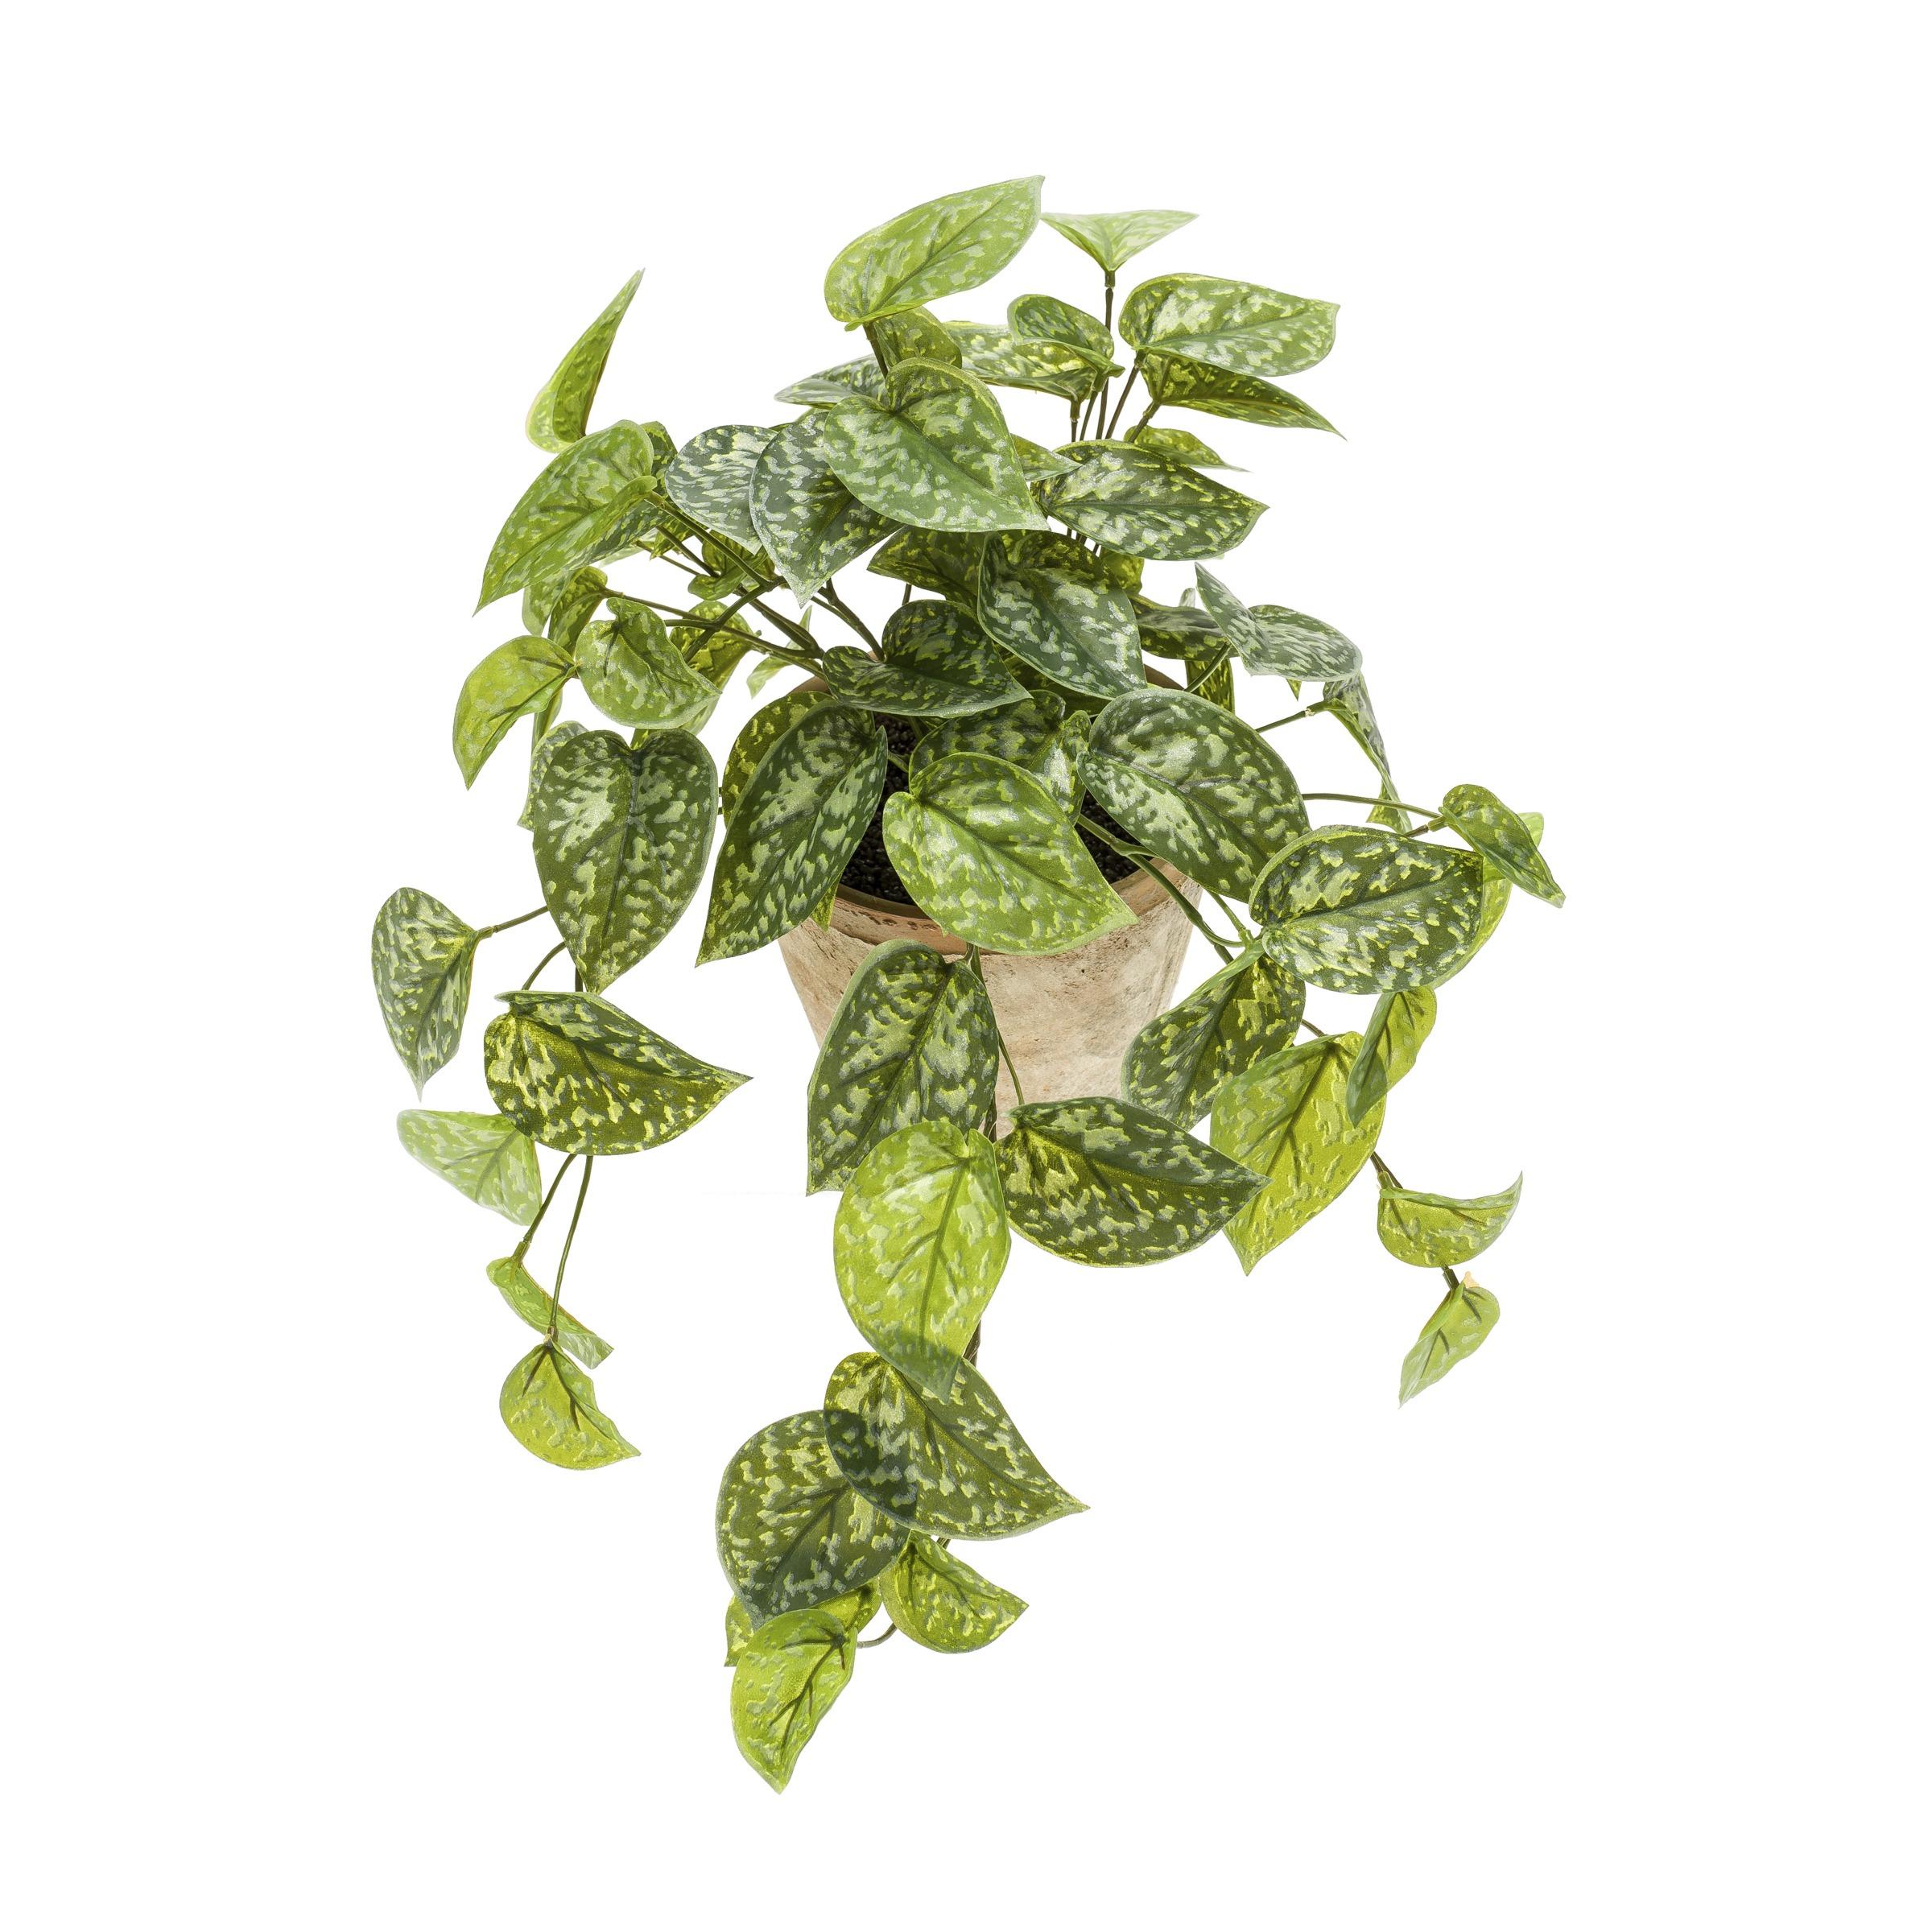 Kunstplant Scindapsus Pictus hanging bush 45 cm in pot